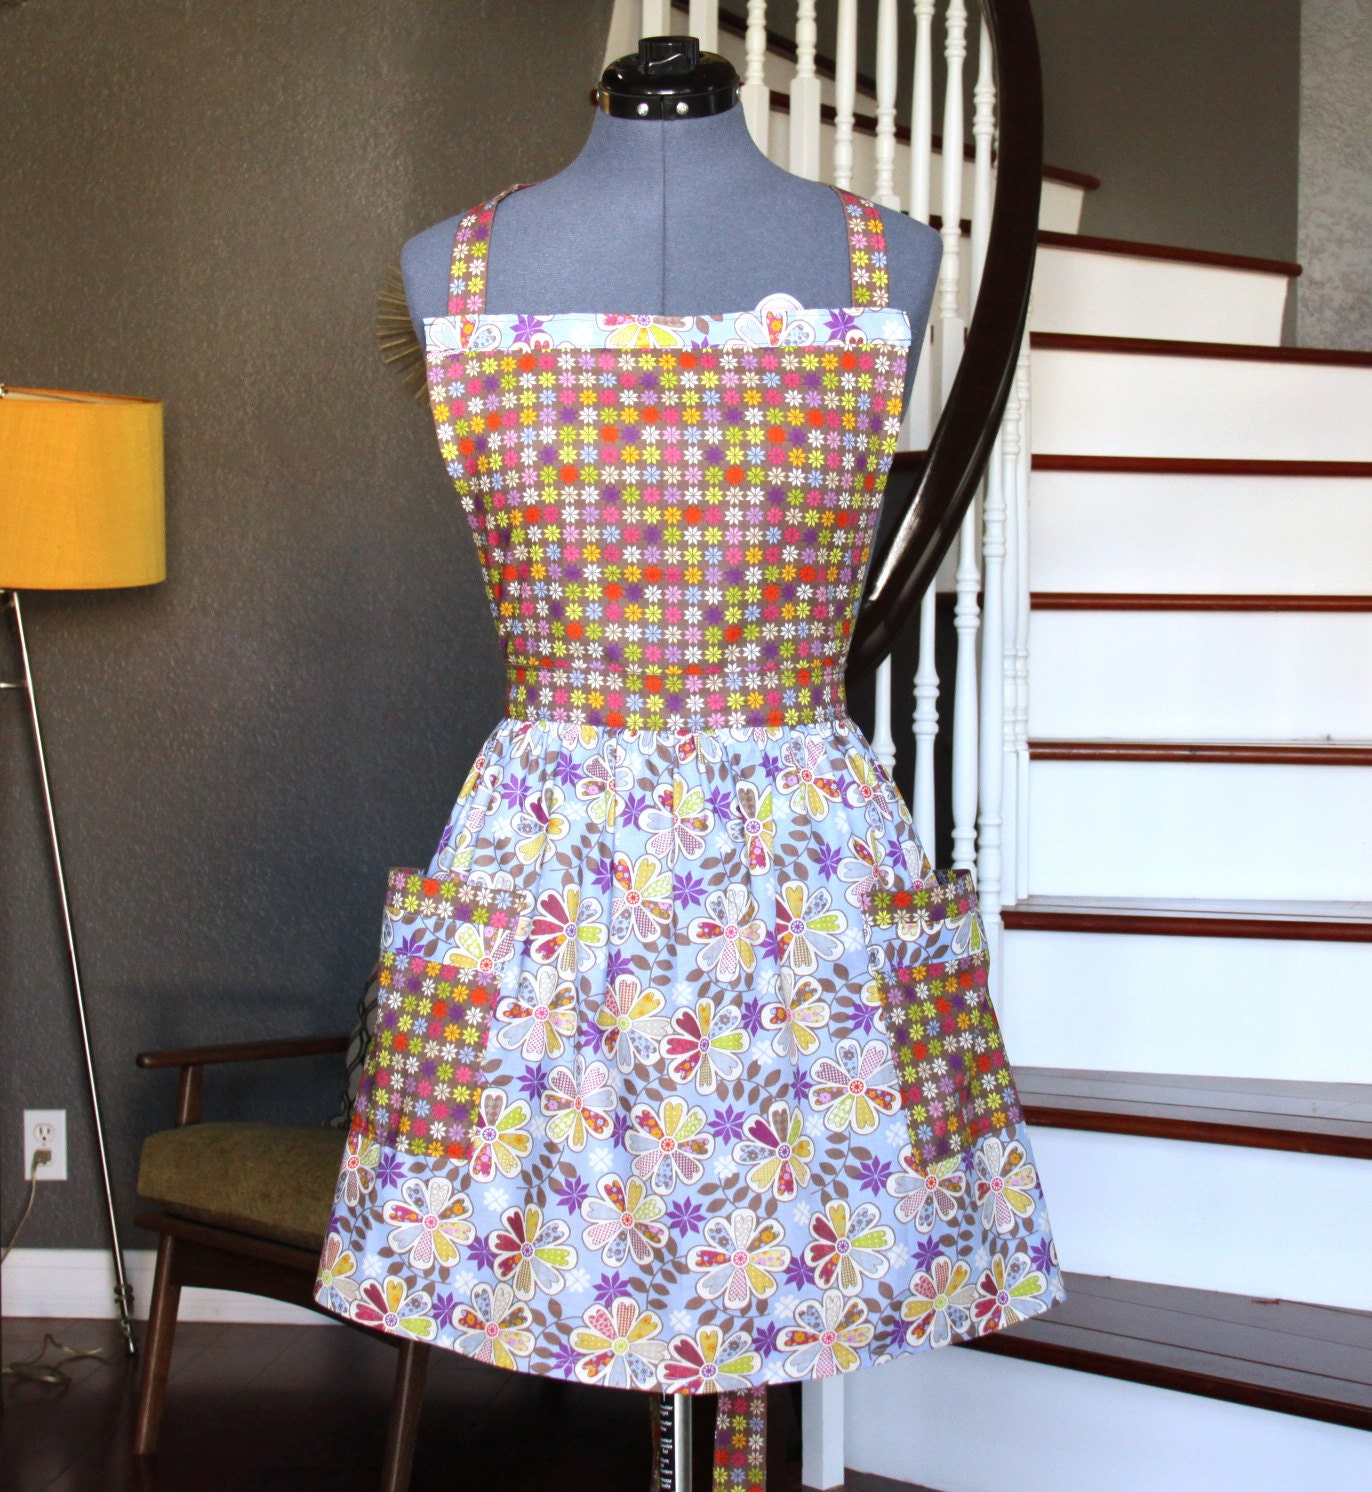 retro aprons for women apron with pockets women aprons blue. Black Bedroom Furniture Sets. Home Design Ideas